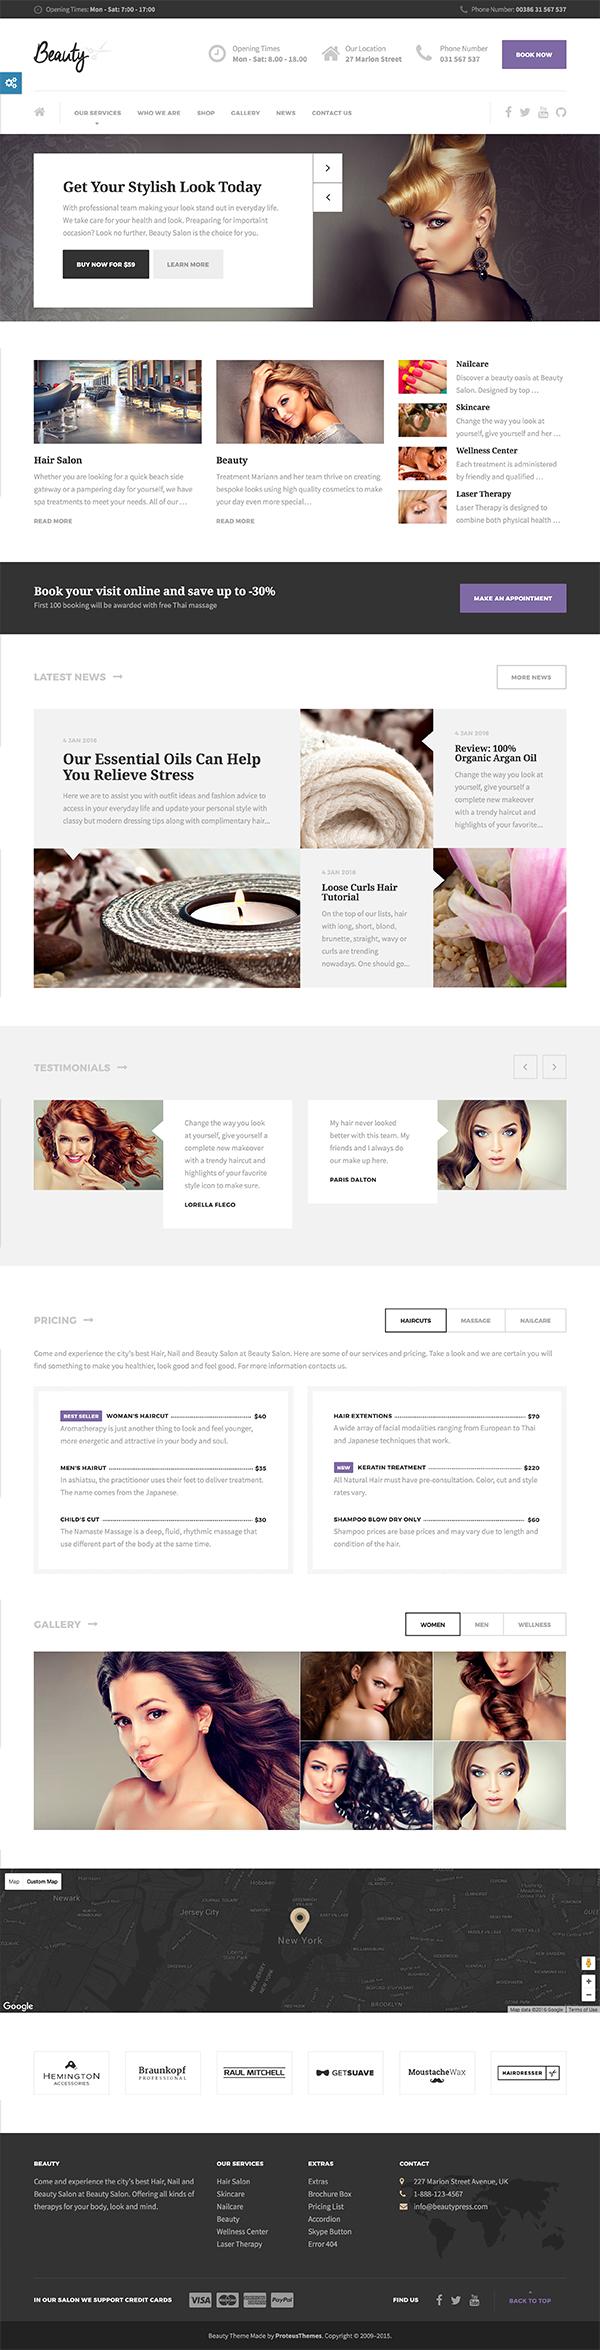 16 Beauty - Hair Salon, Nail, Spa, Fashion WP Theme